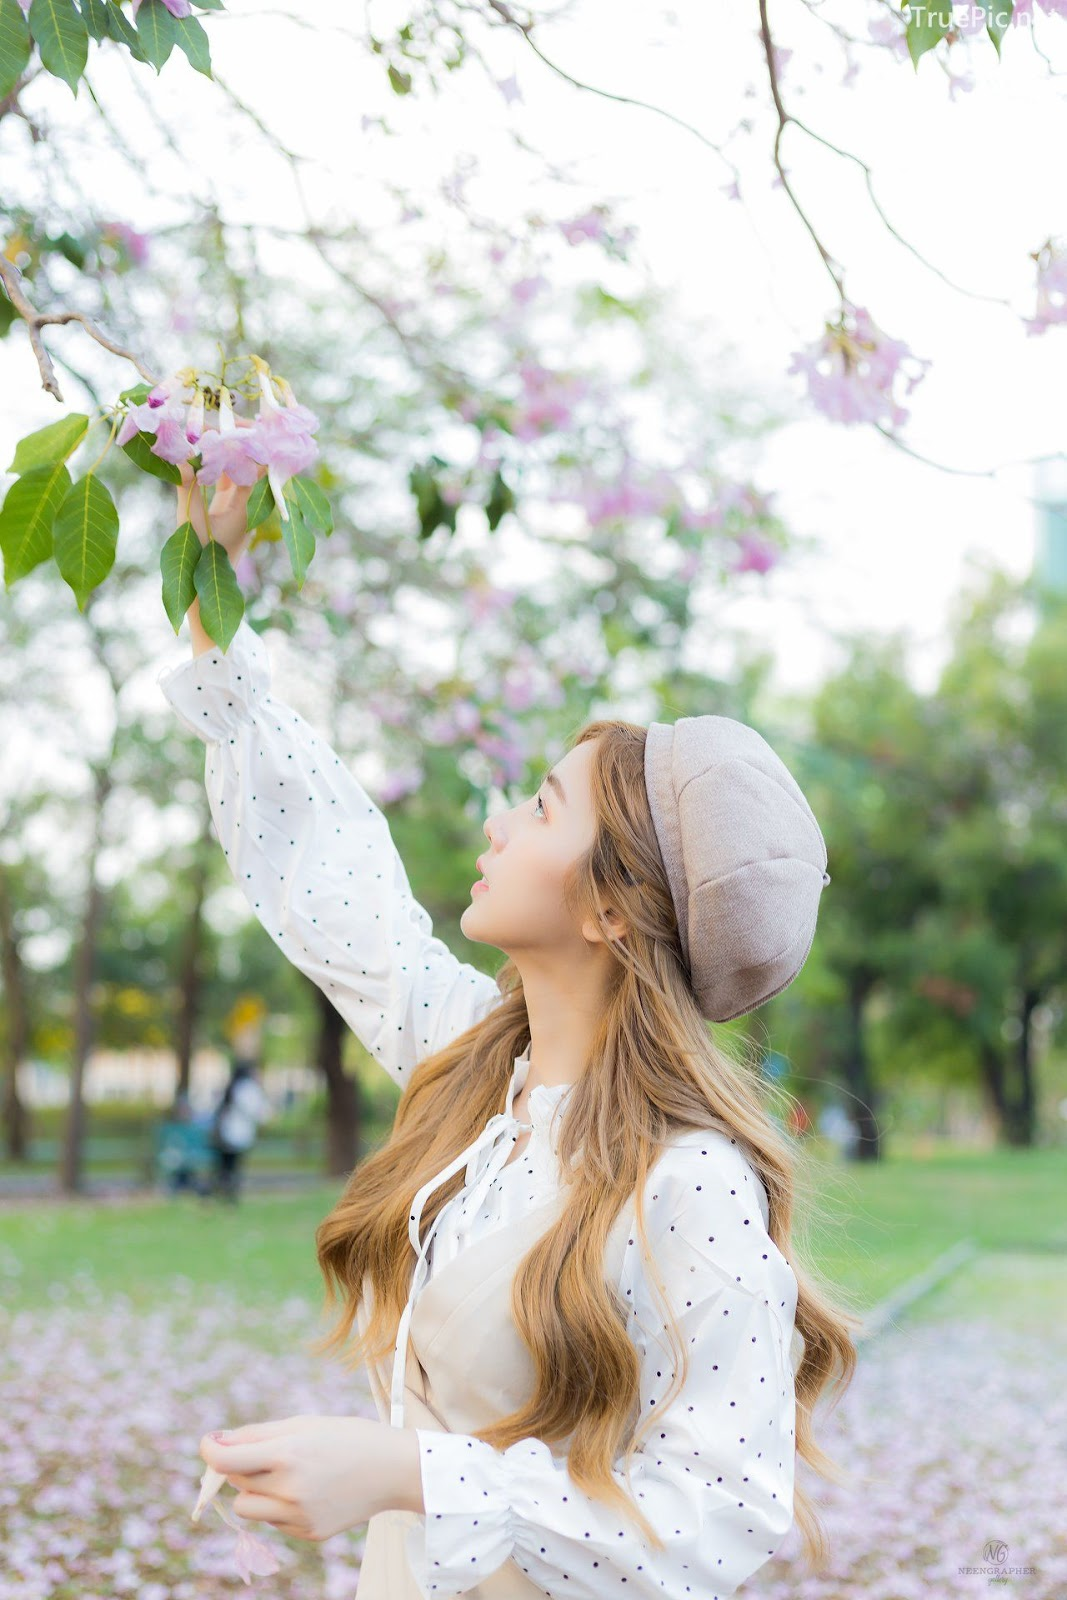 Thailand cute model Nilawan Iamchuasawad - Beautiful girl in the flower field - Photo by จิตรทิวัส จั่นระยับ - Picture 1